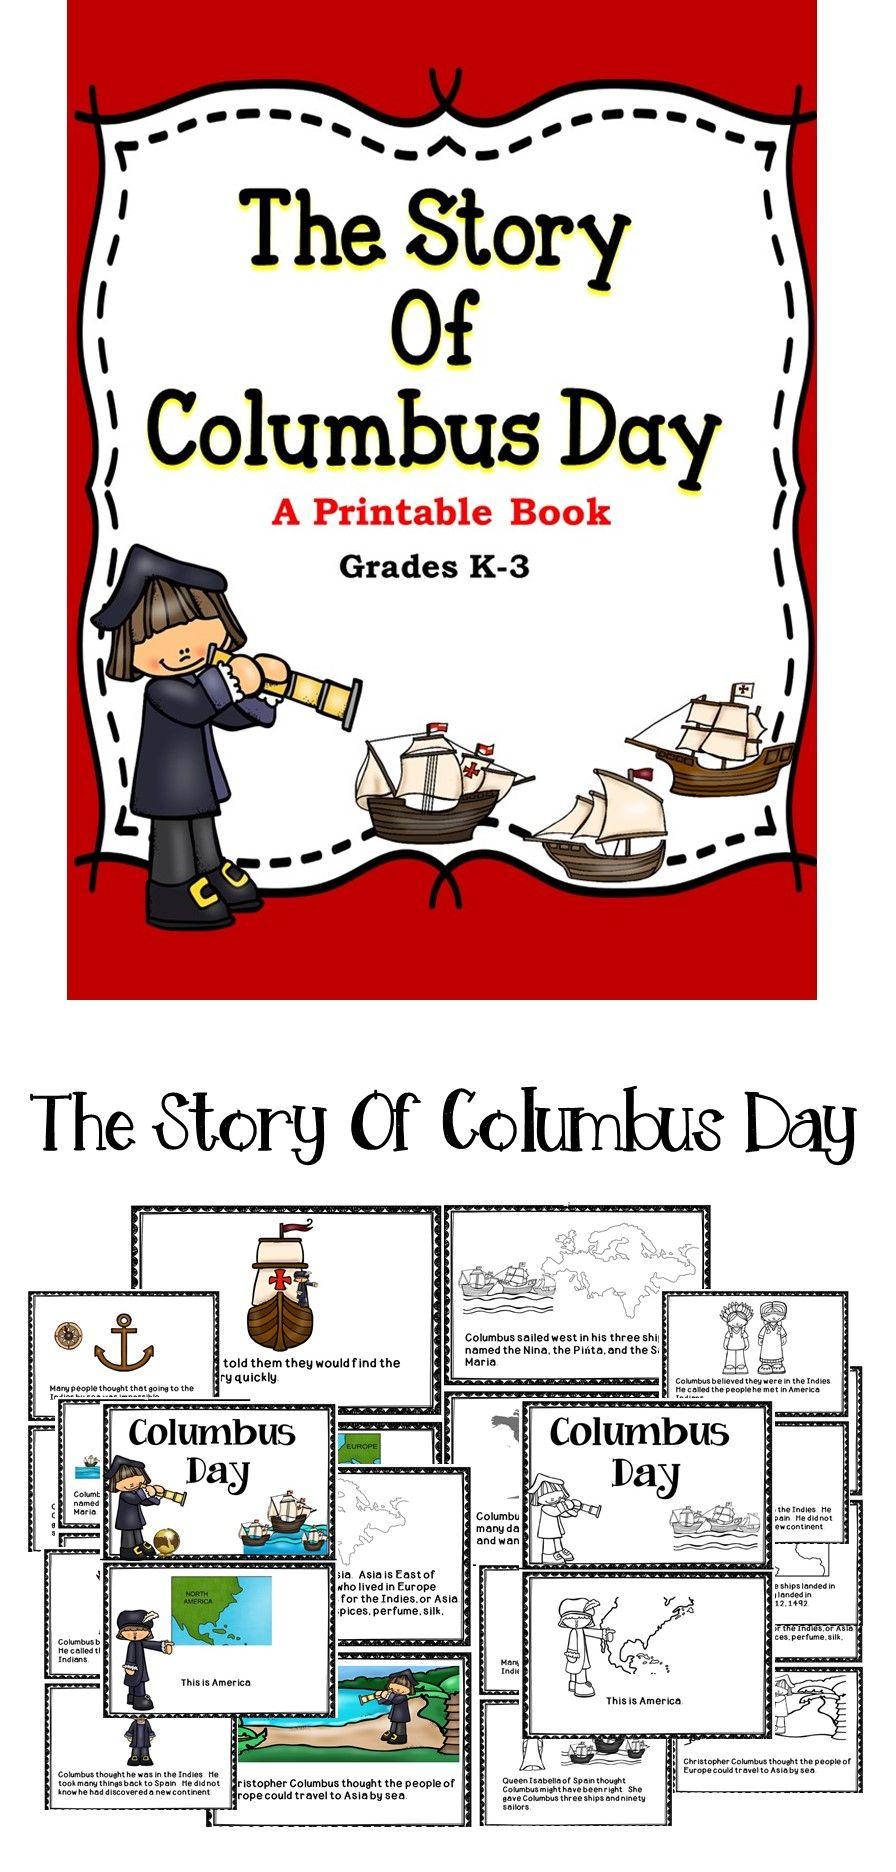 medium resolution of https://dubaikhalifas.com/columbus-day-learning-about-christopher-columbus/